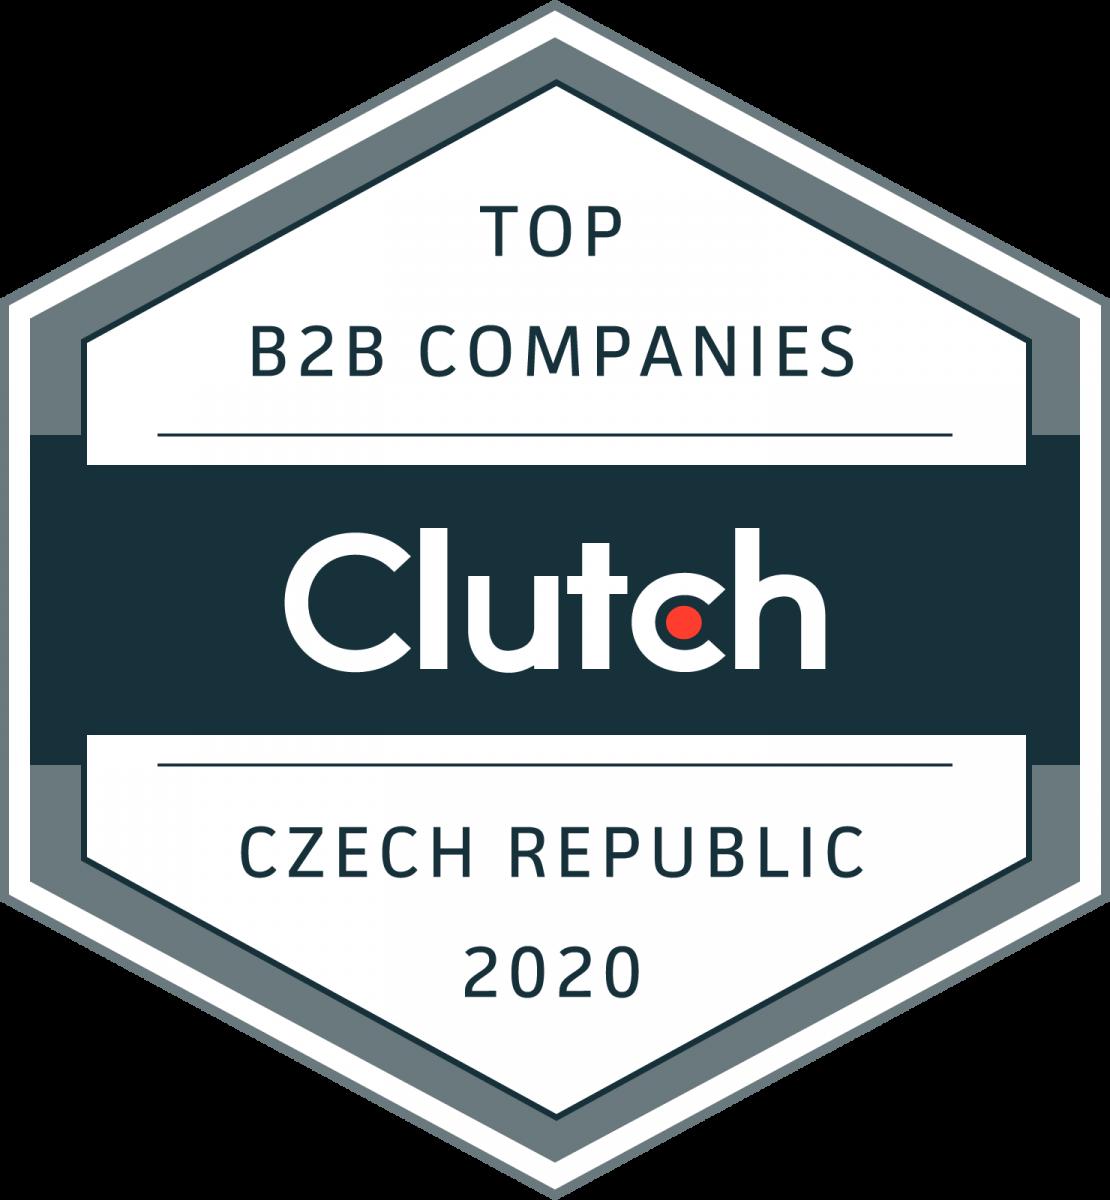 Top B2B Companies Czech Republic